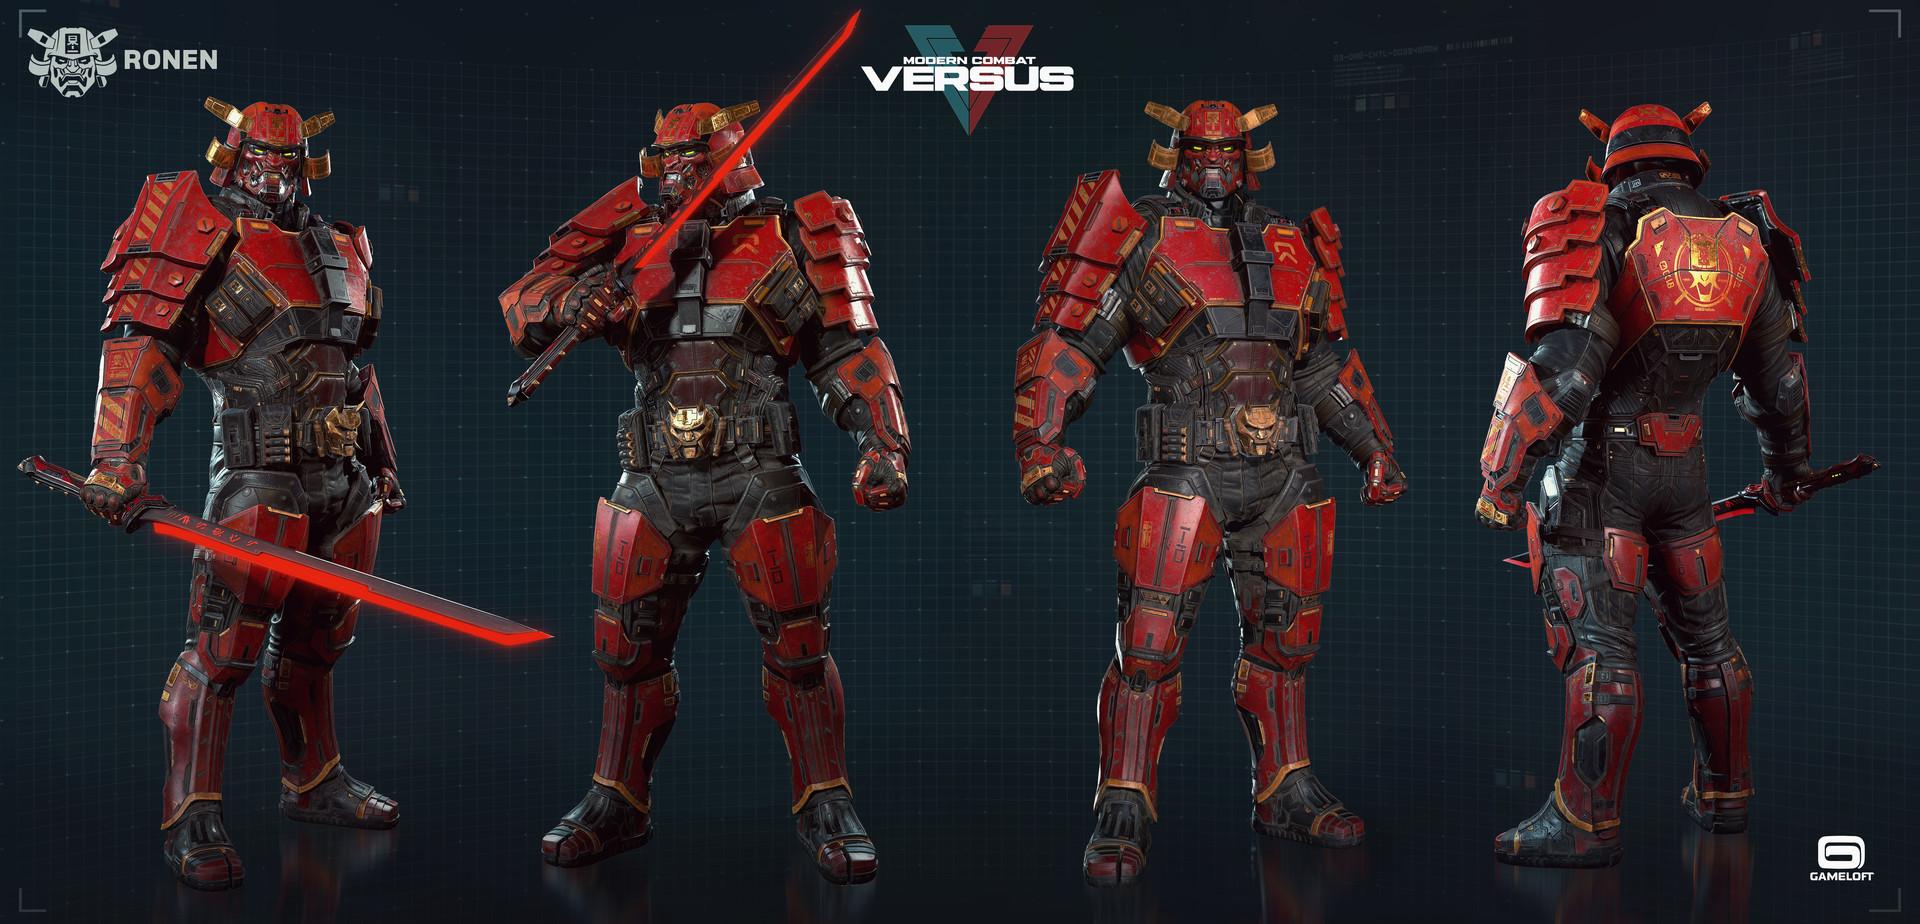 Rodrigue Pralier - Ronen - Modern Combat Versus - Gameloft